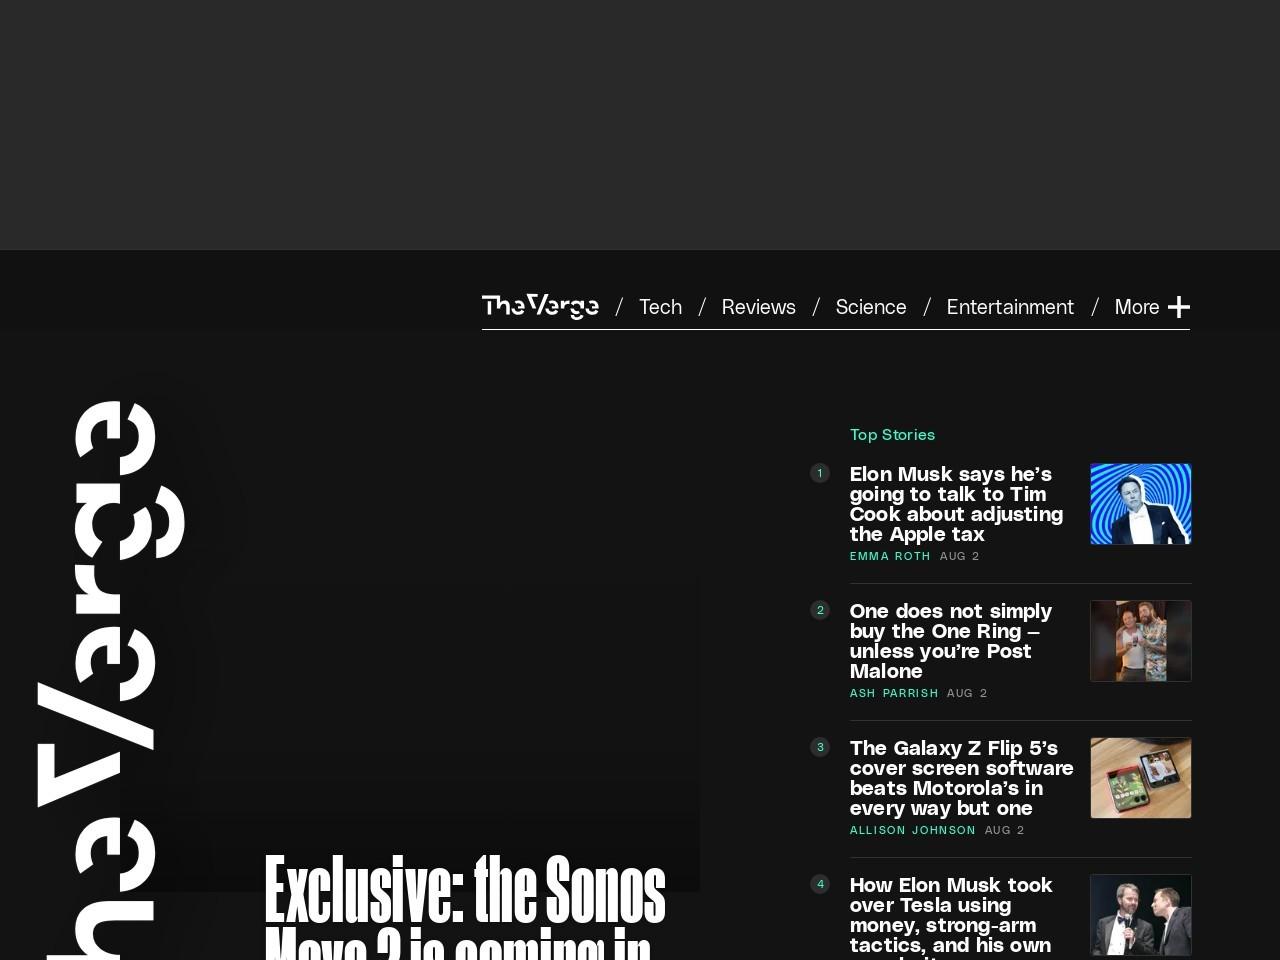 Adobe's got Photoshop running in Chrome | The Verge